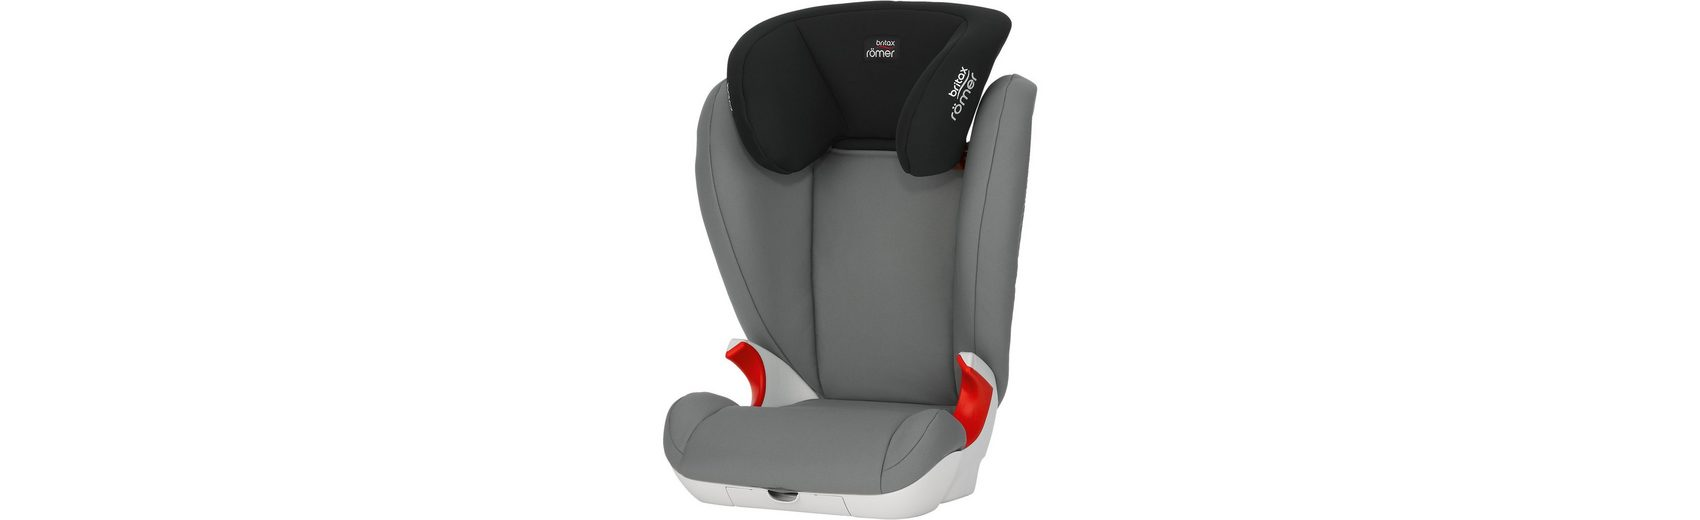 Britax Römer Auto-Kindersitz Kid II, Steel Grey, 2016